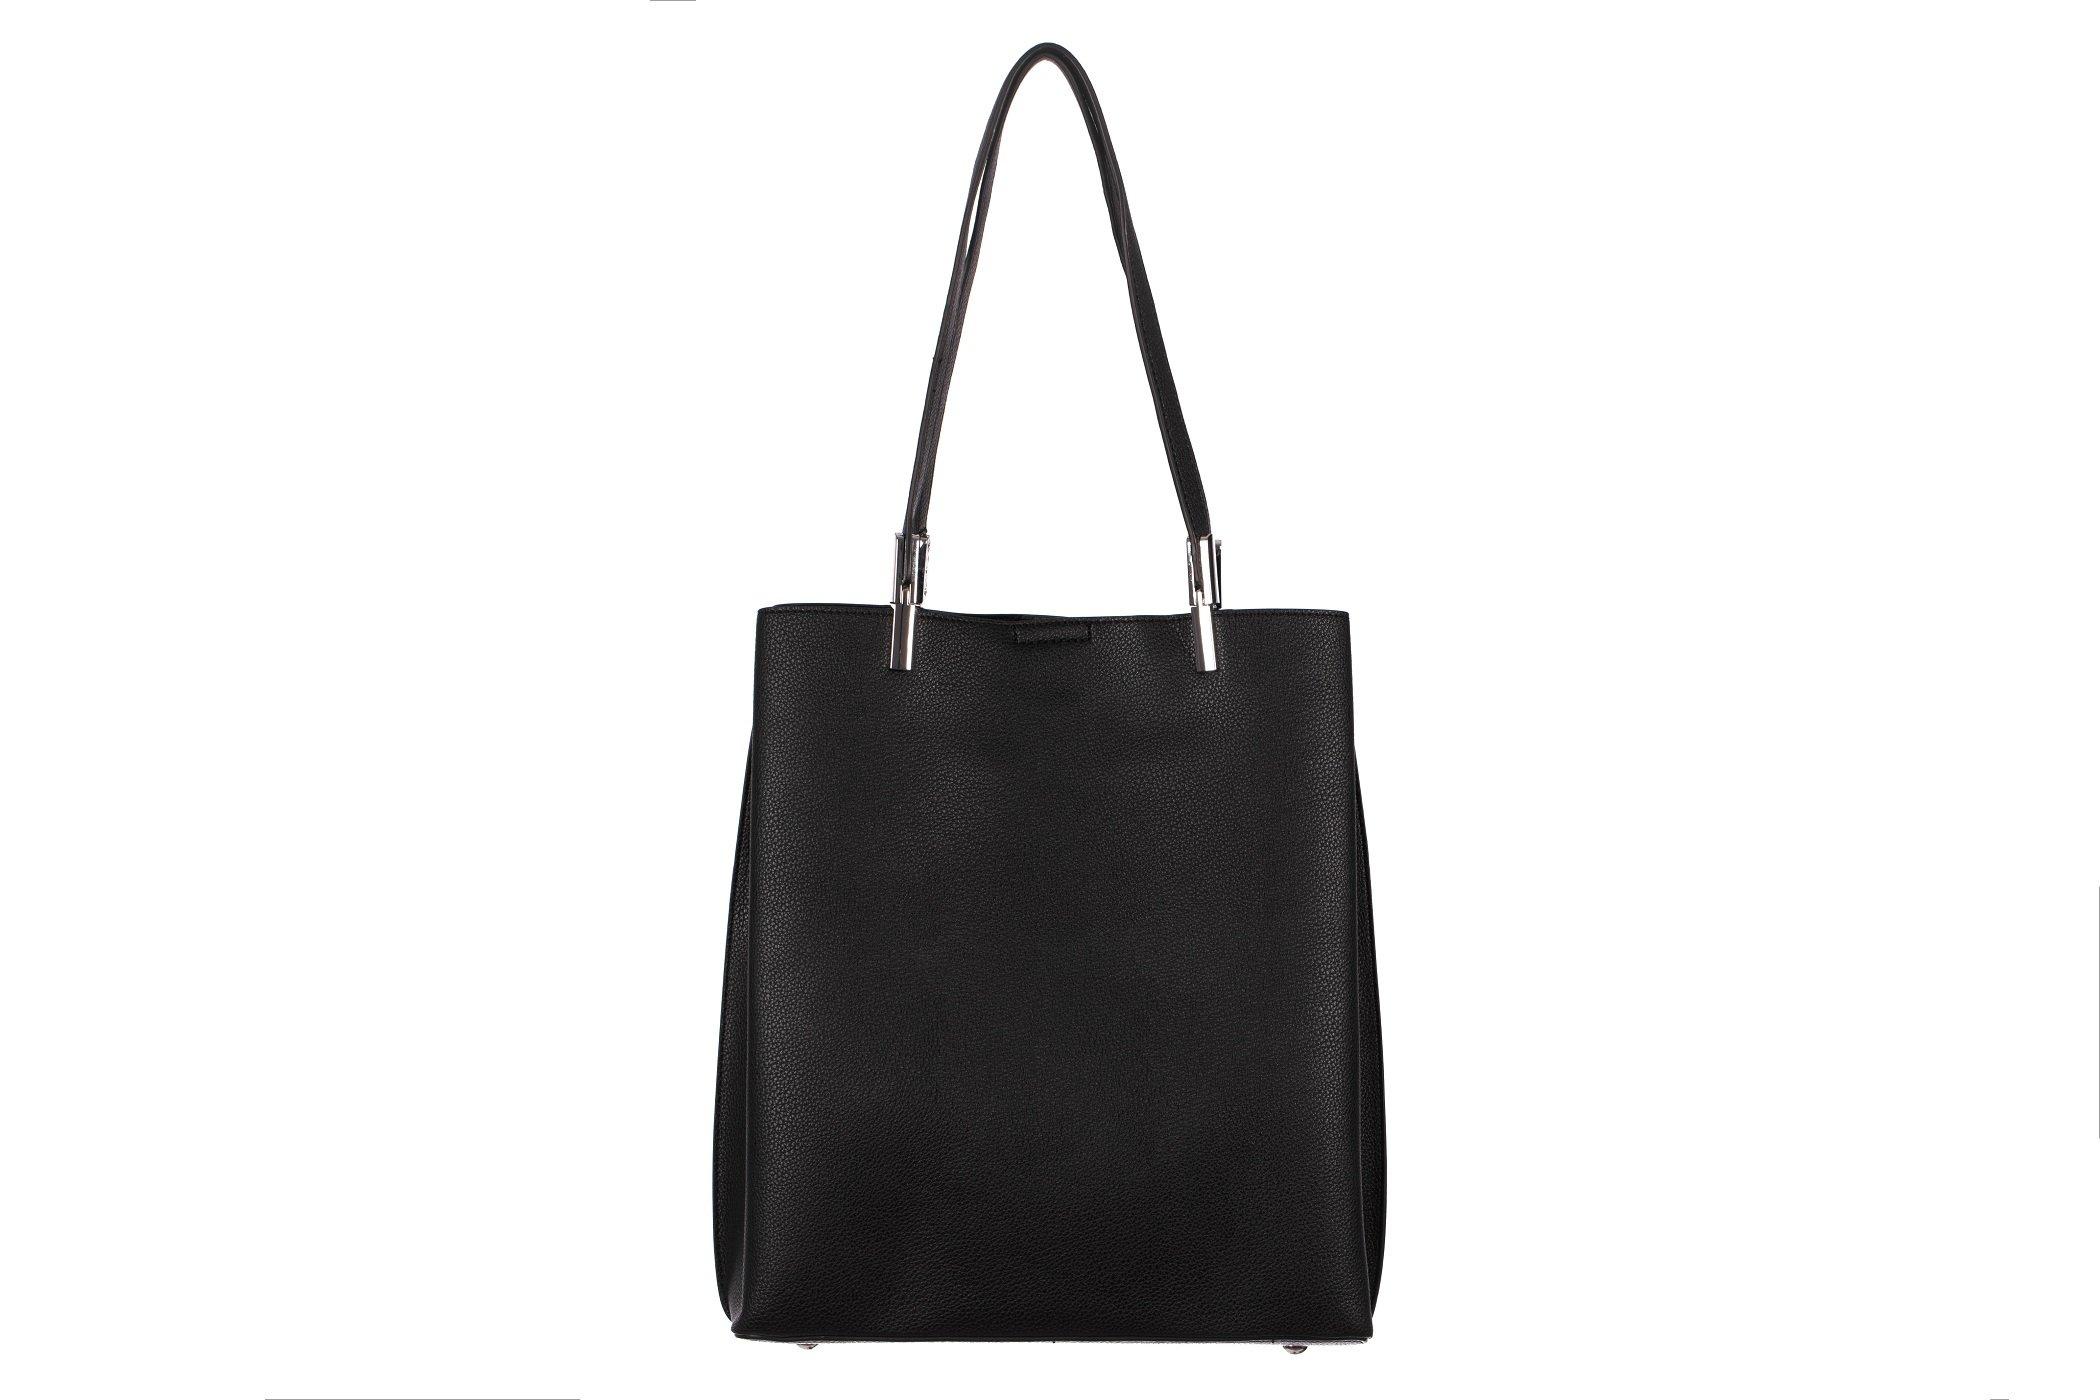 9ccfb41793082 ... Klasyczna pojemna torebka damska A4 3 komory shopper bag ...